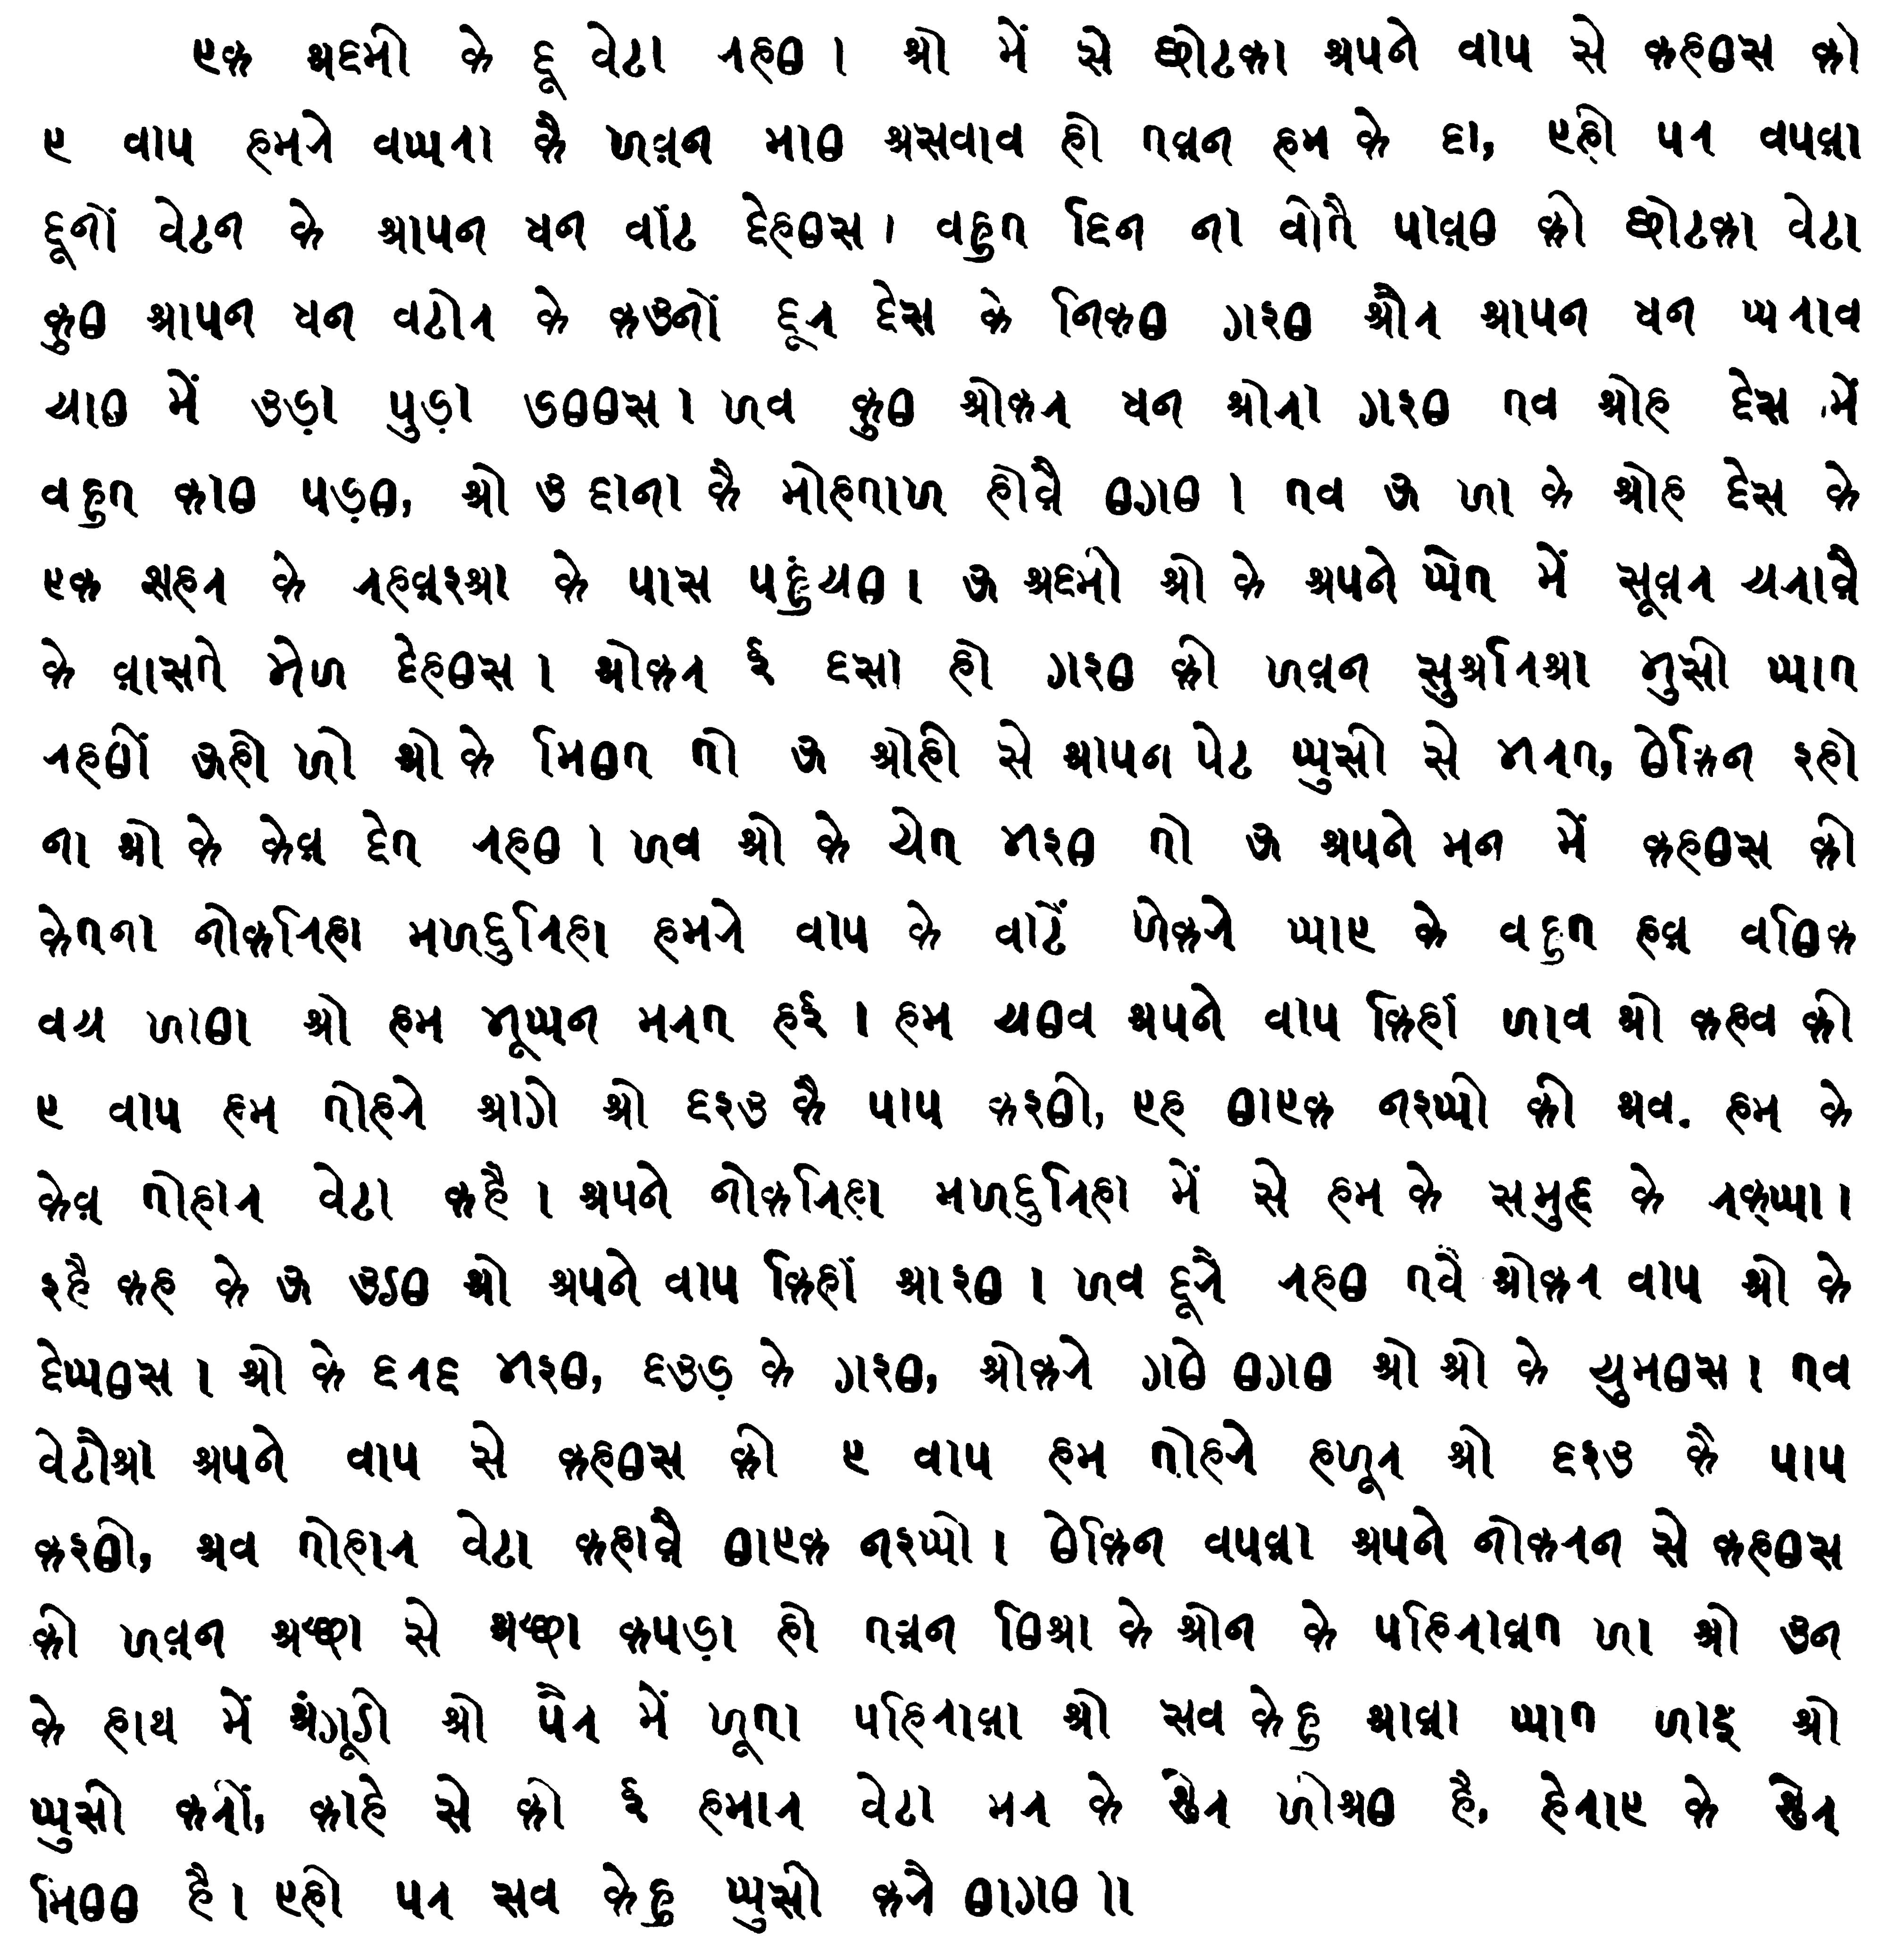 File:Kaithi2.png - Wikimedia Commons